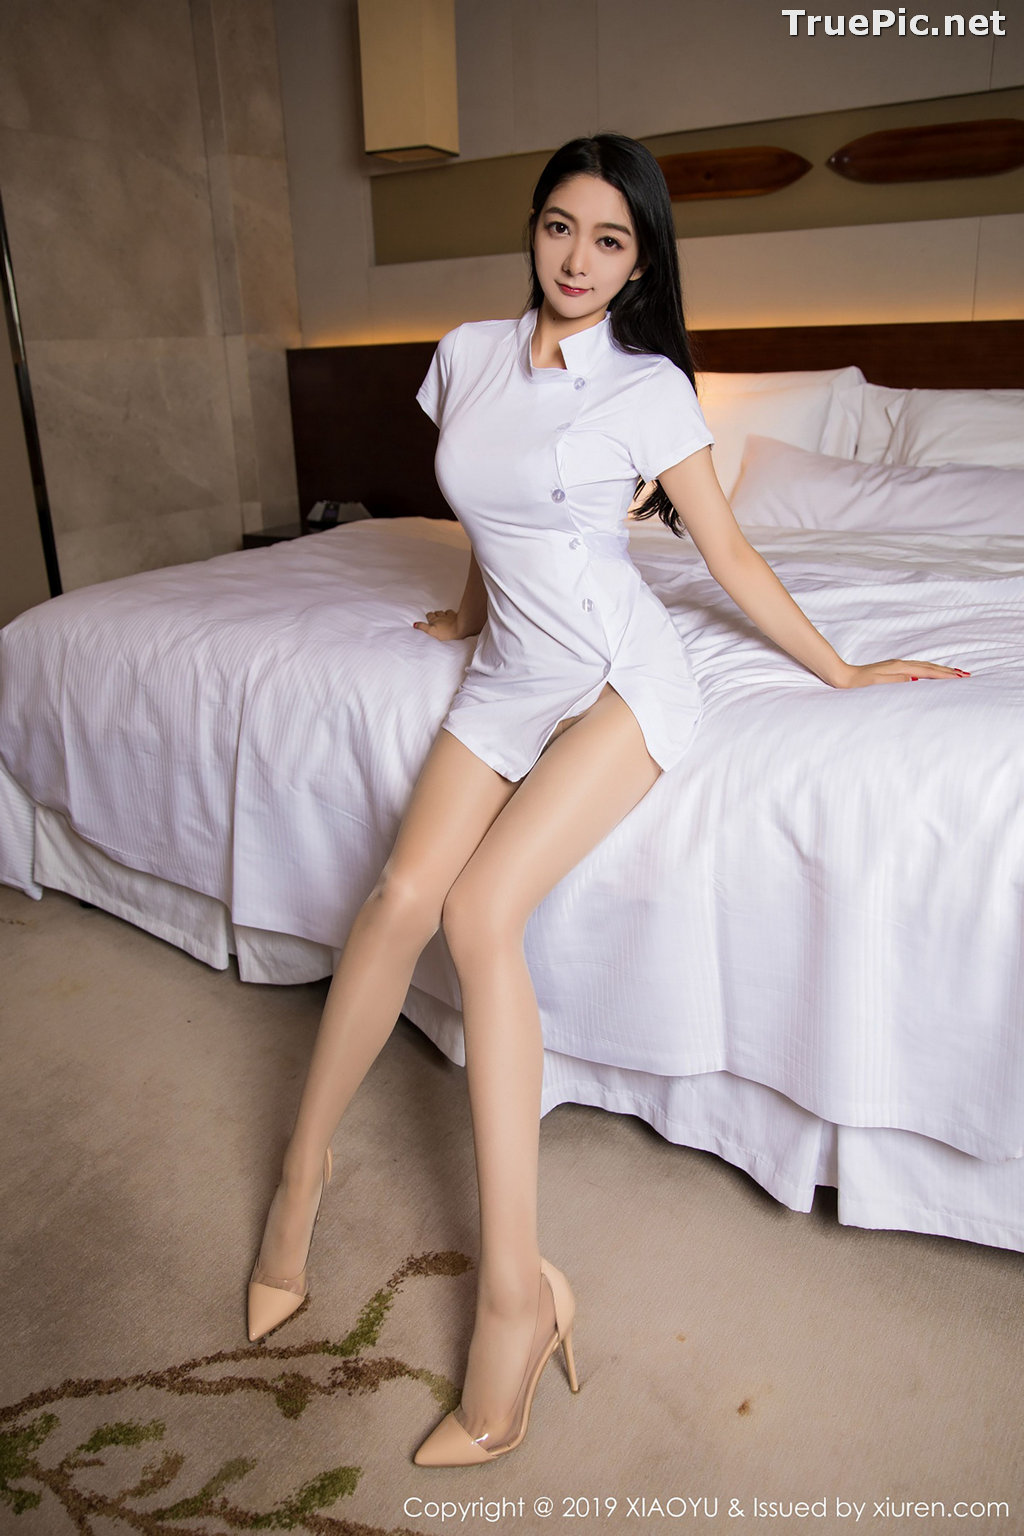 Image XiaoYu No.004 - Chinese Model - Xiao Reba (Angela喜欢猫) - White Sexy Nurse - TruePic.net - Picture-1